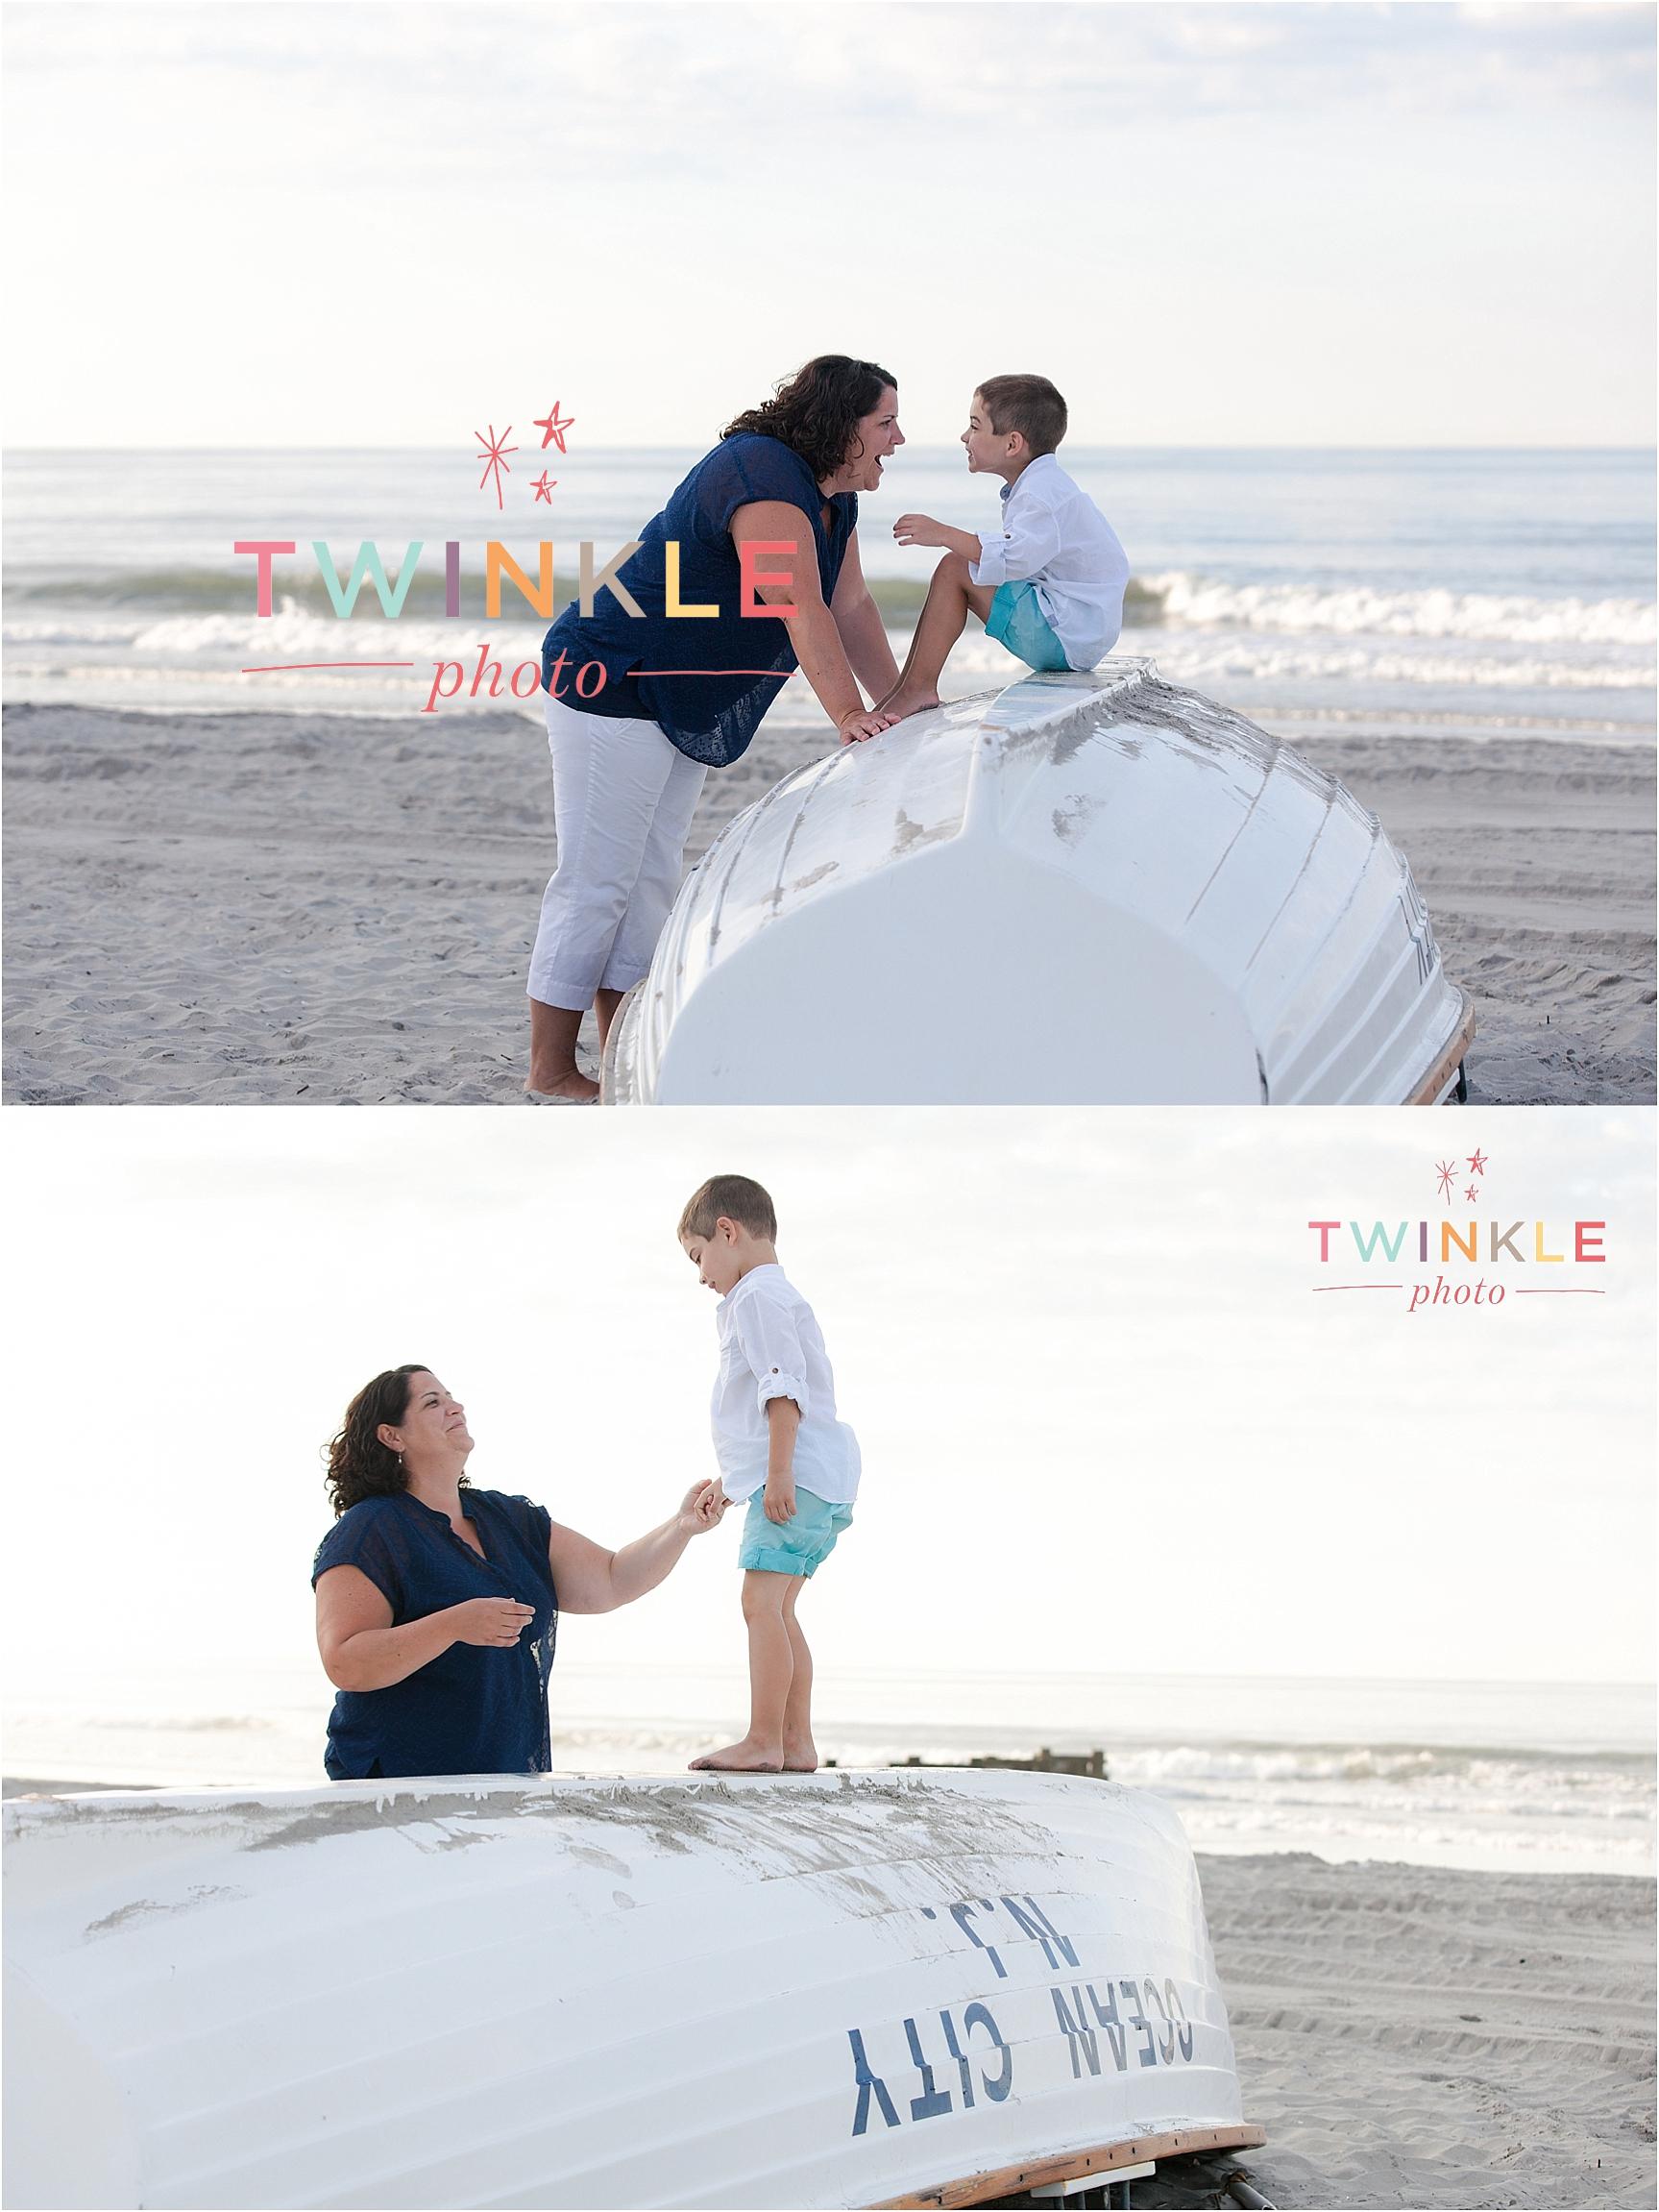 OCNJ Ocean City Beach Photography Family Portrait Photographer NJ New Jersey -07